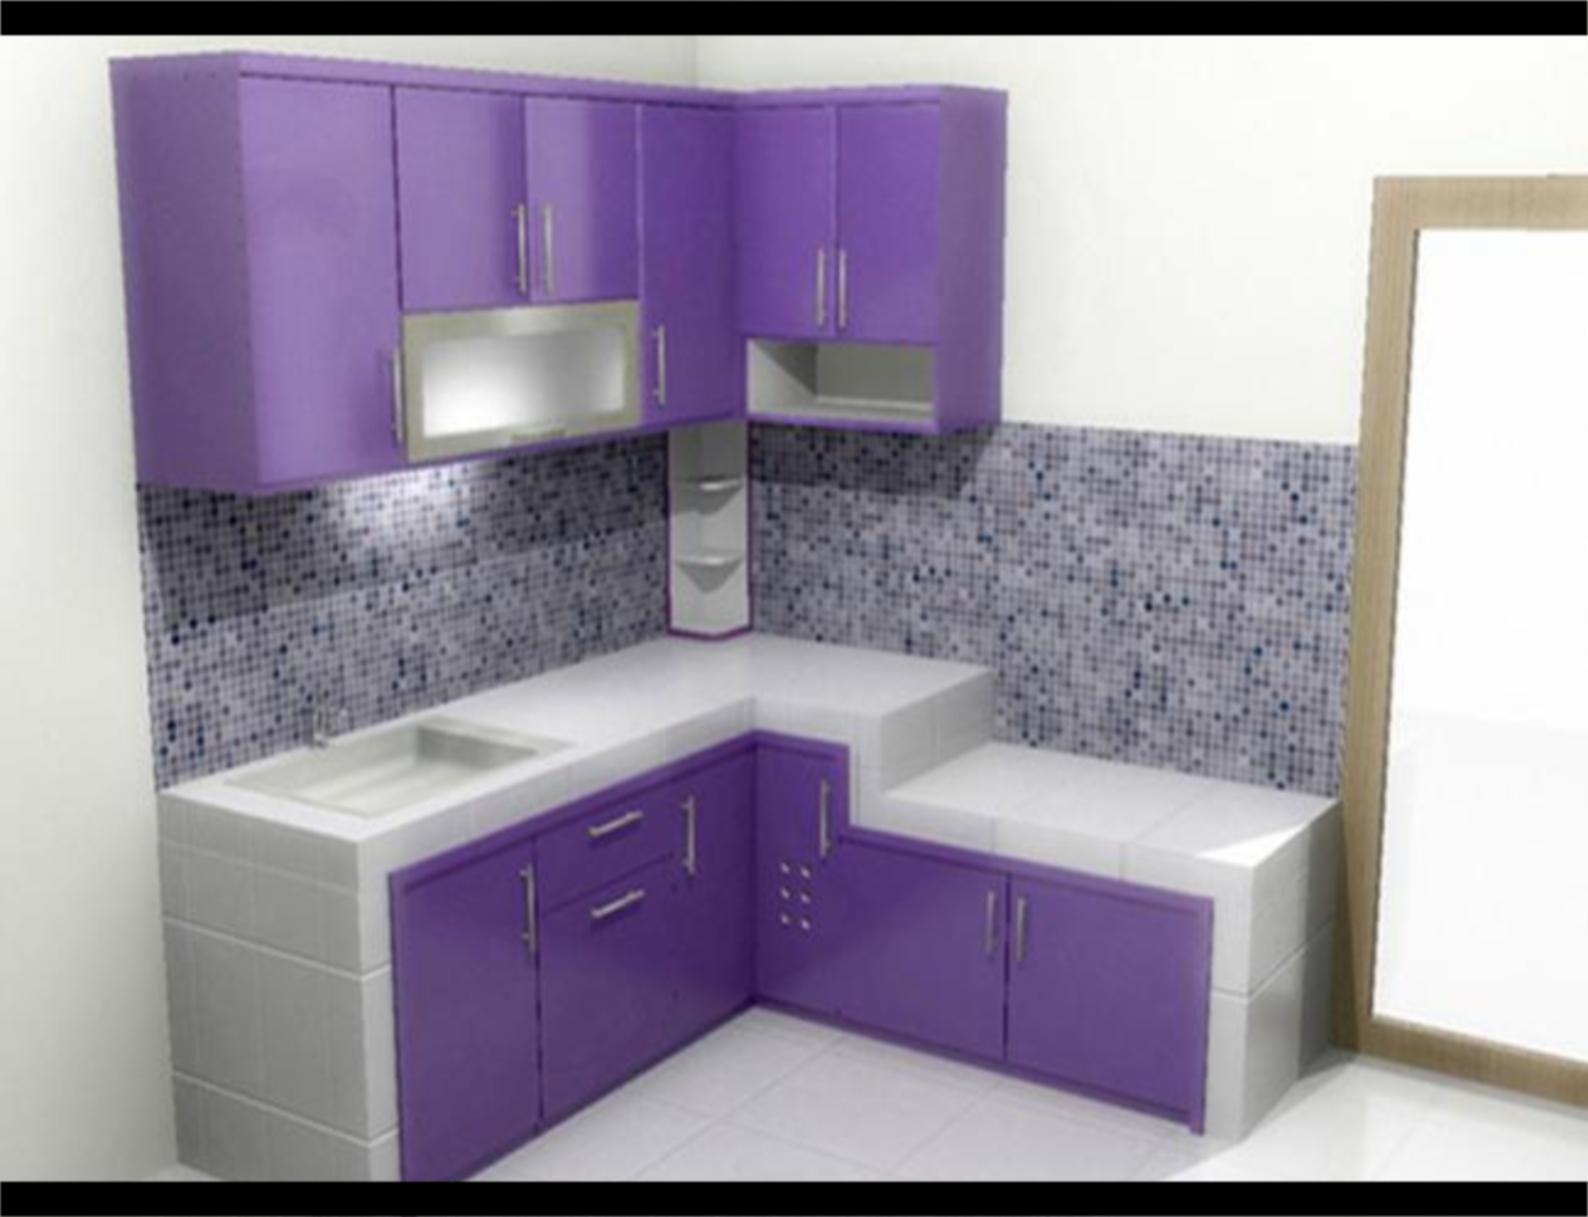 Design Interior Dapur Warna Ungu Gambar Desain Rumah Minimalis